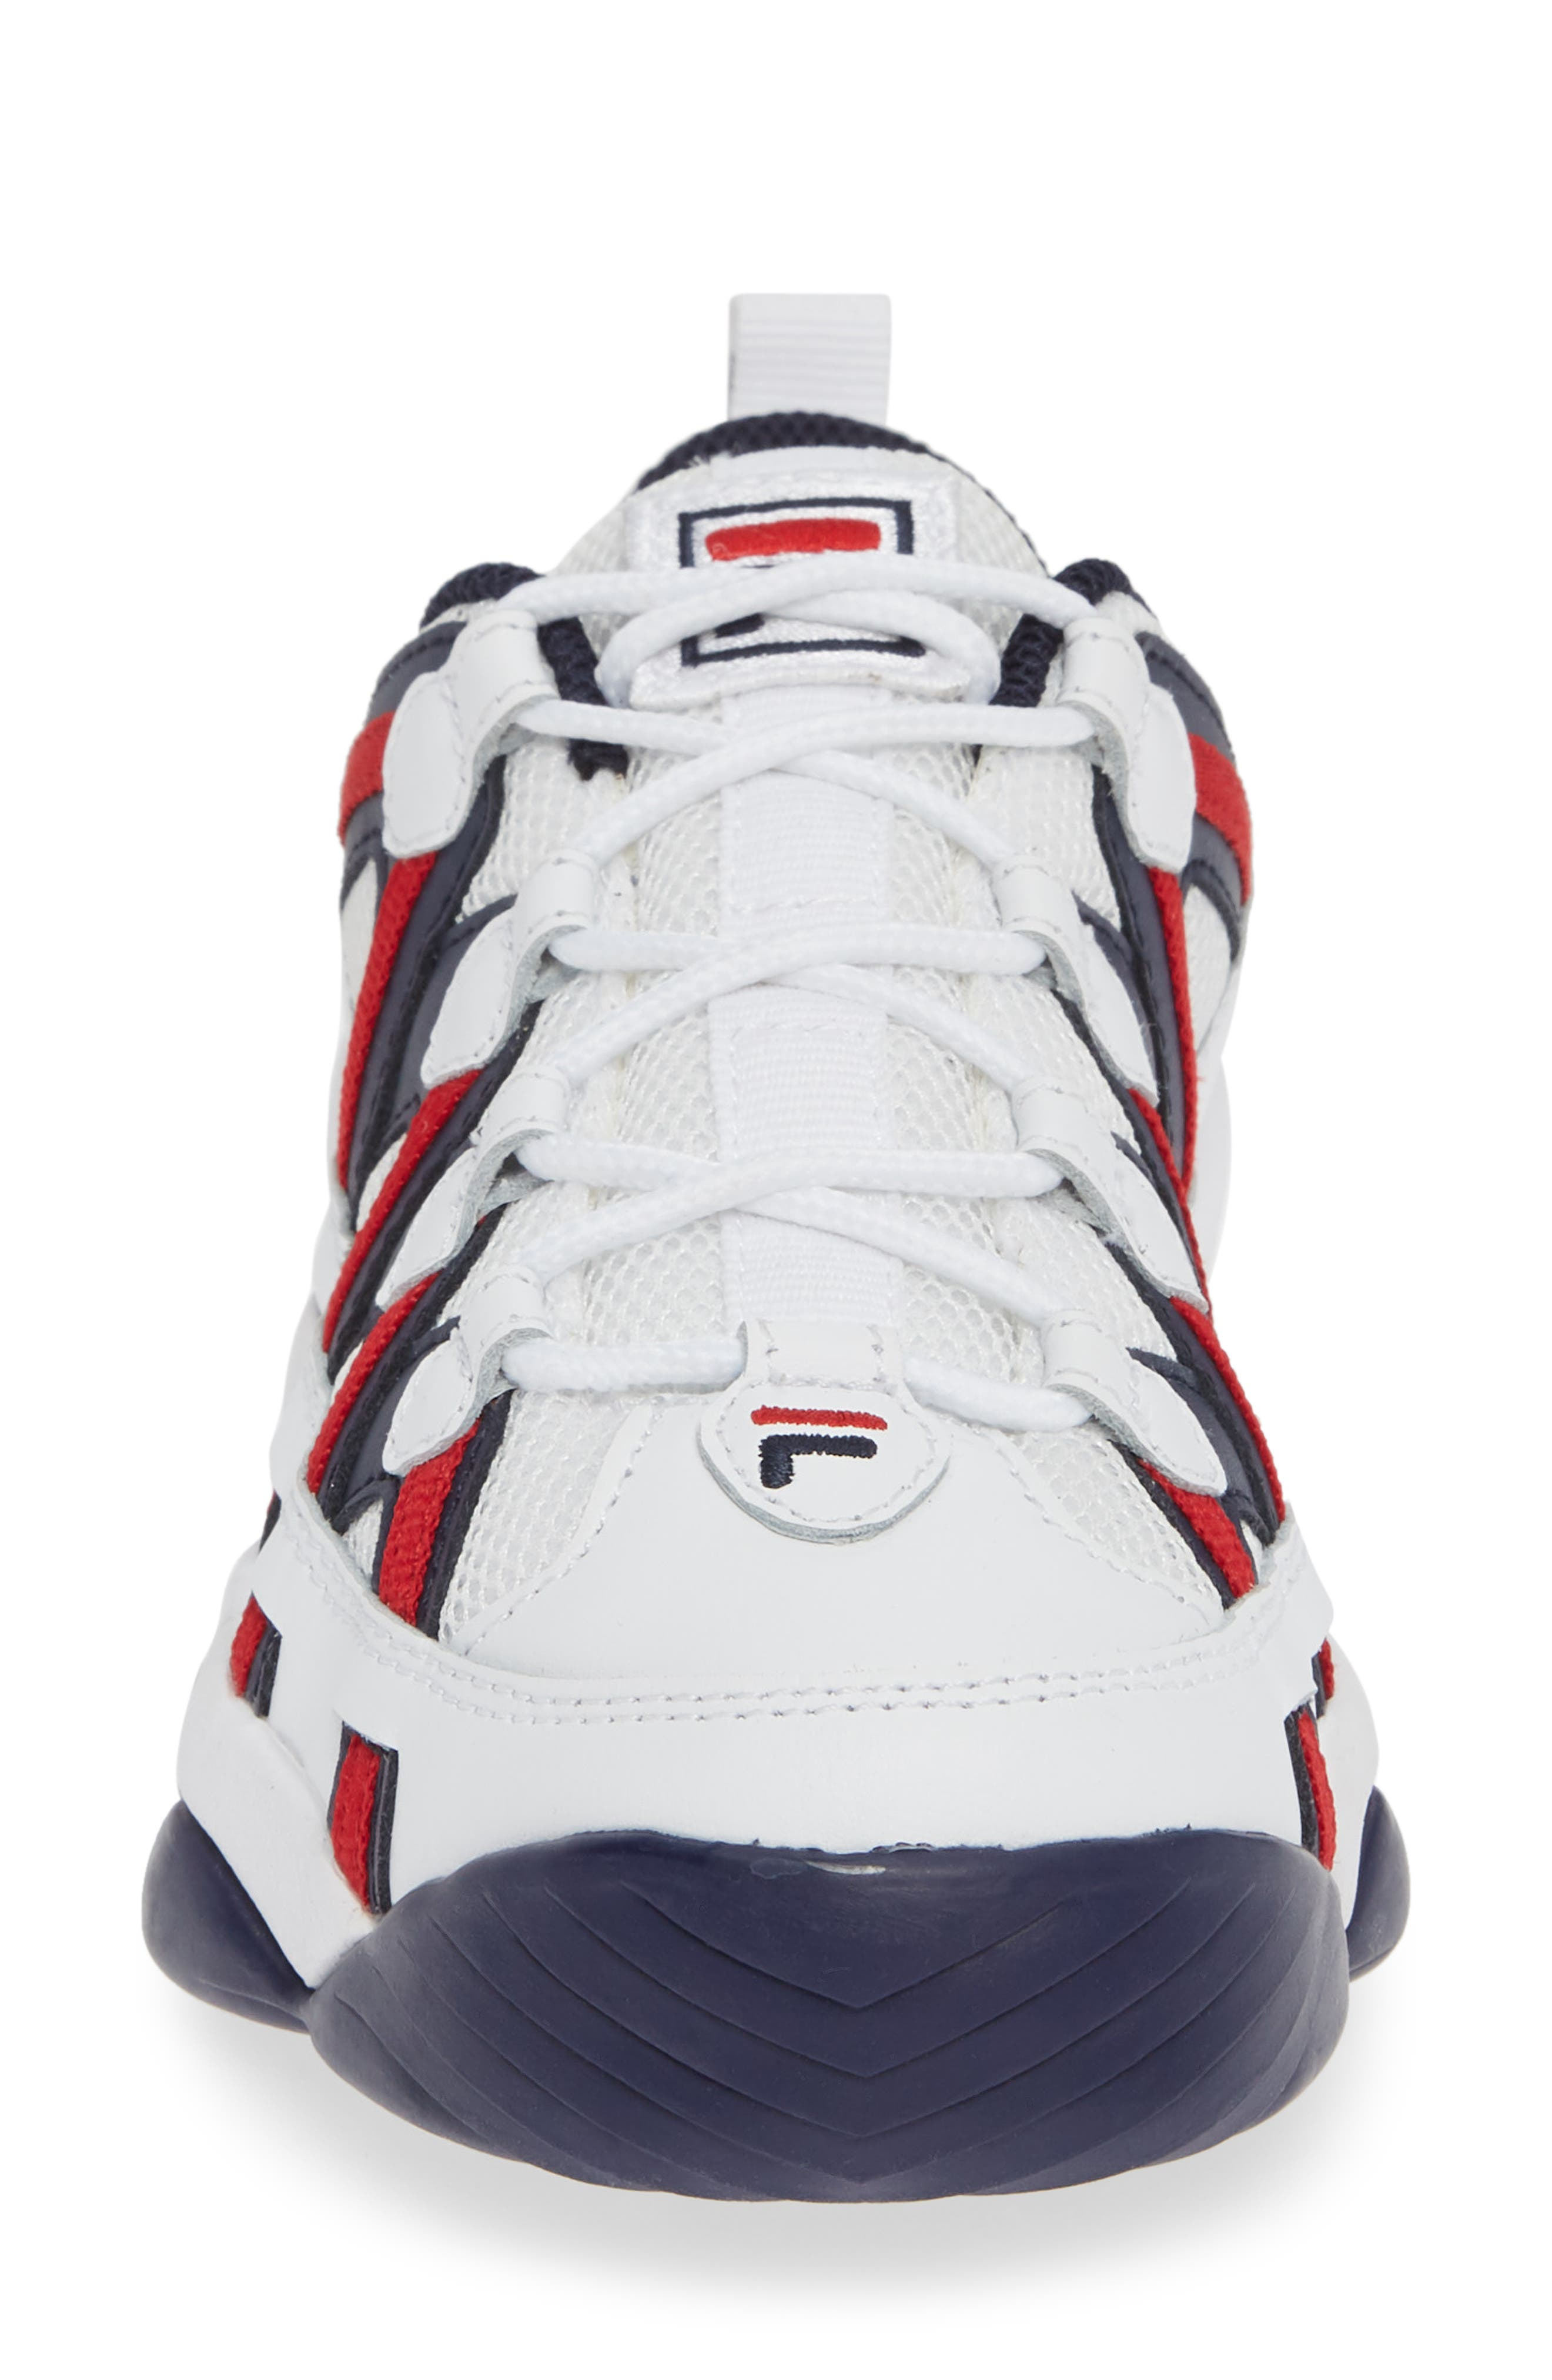 FILA, Spaghetti Low Sneaker, Alternate thumbnail 4, color, WHITE/ FILA NAVY/ FILA RED